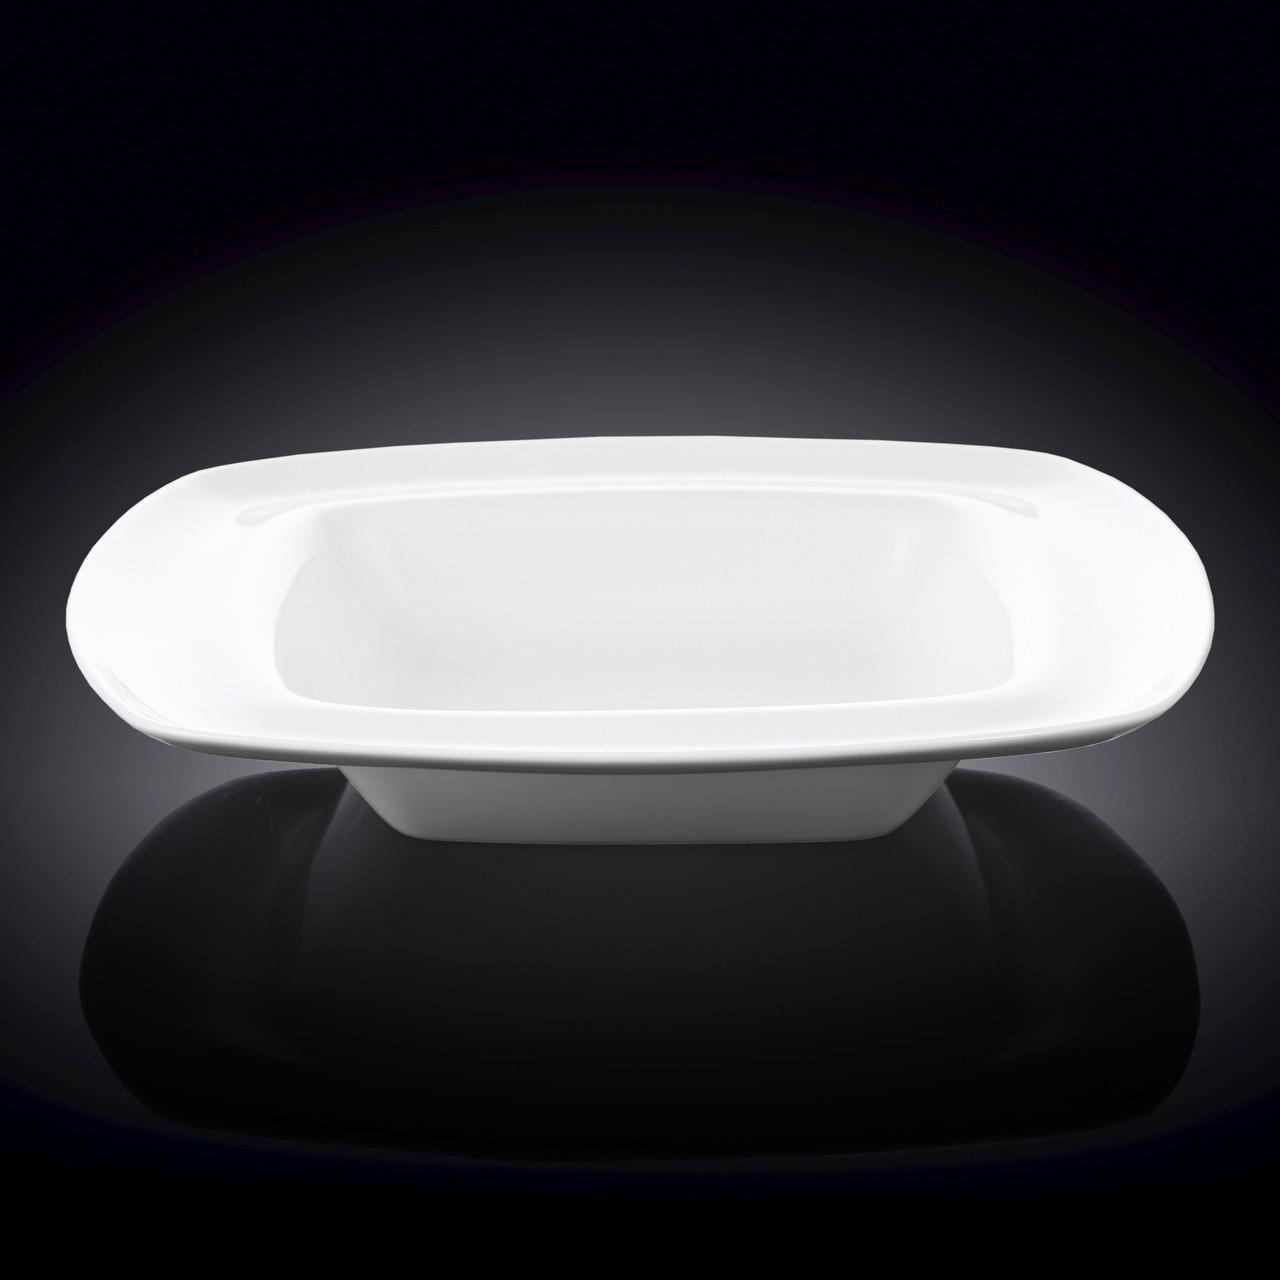 Тарелка глубокая квадратная Wilmax Undina 24см 380мл